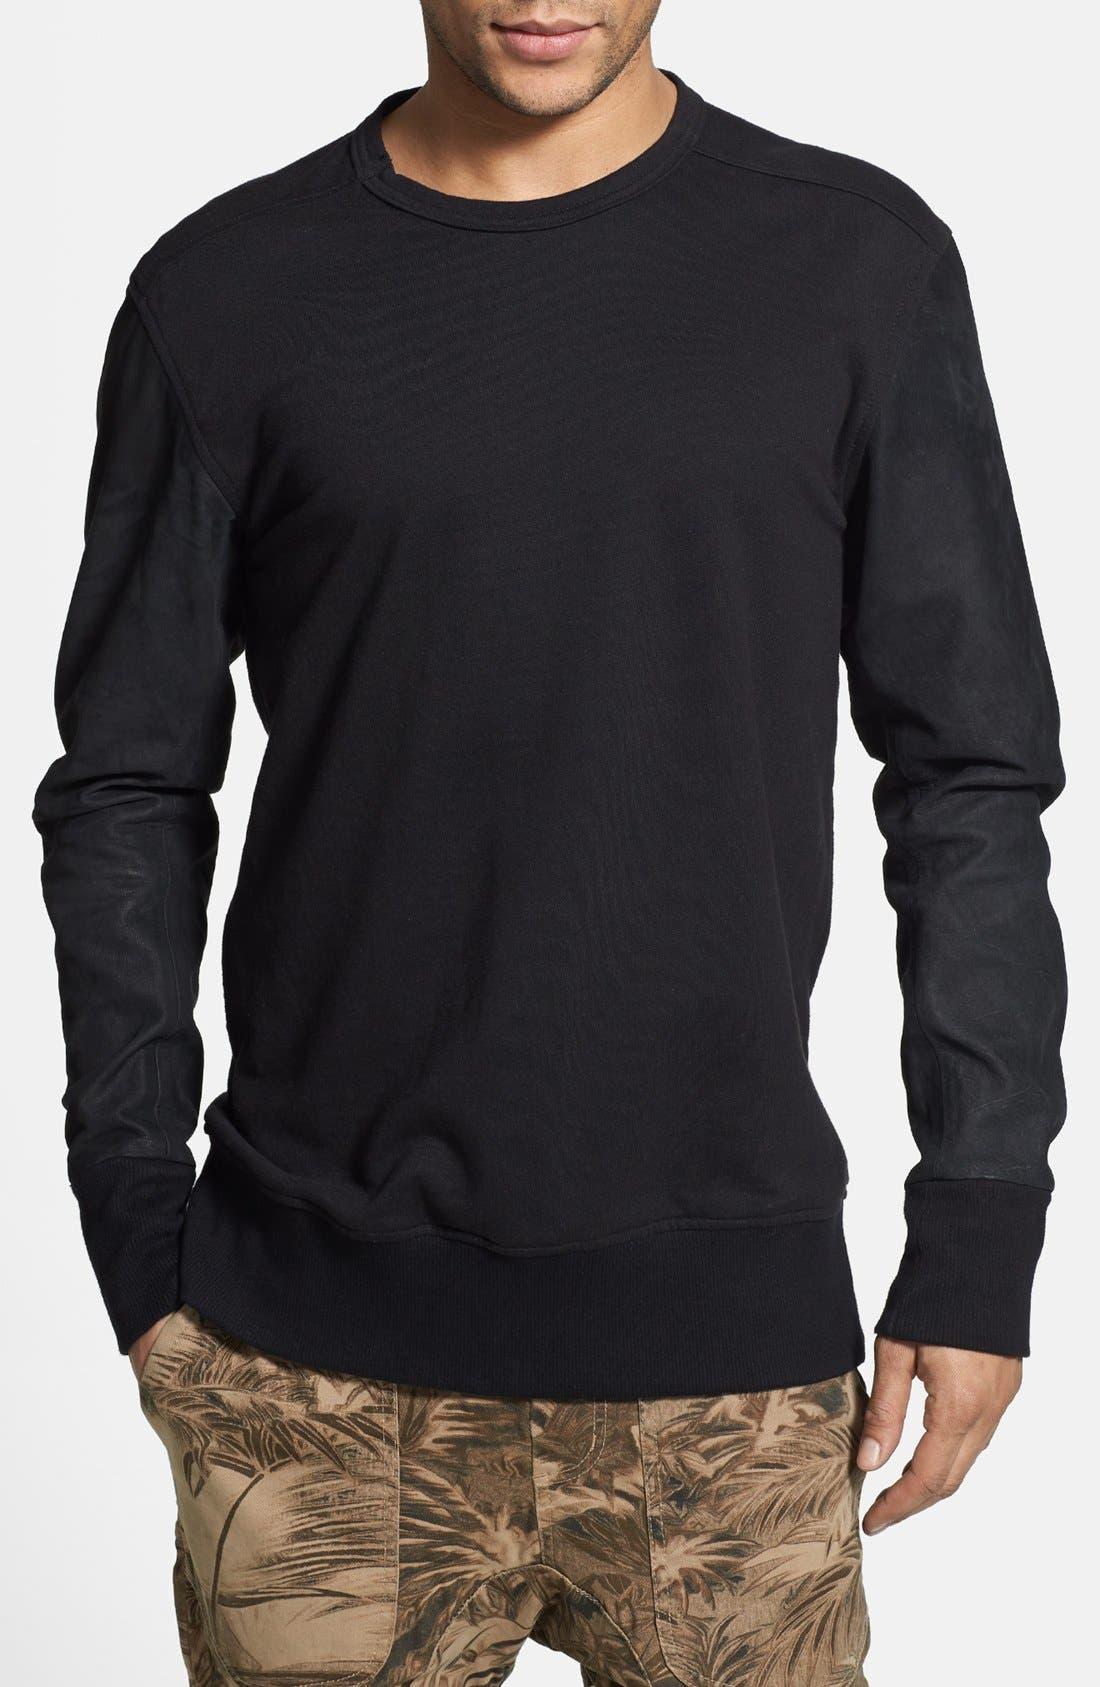 Main Image - ZANEROBE 'Primal' Crewneck Sweatshirt with Suede Sleeves